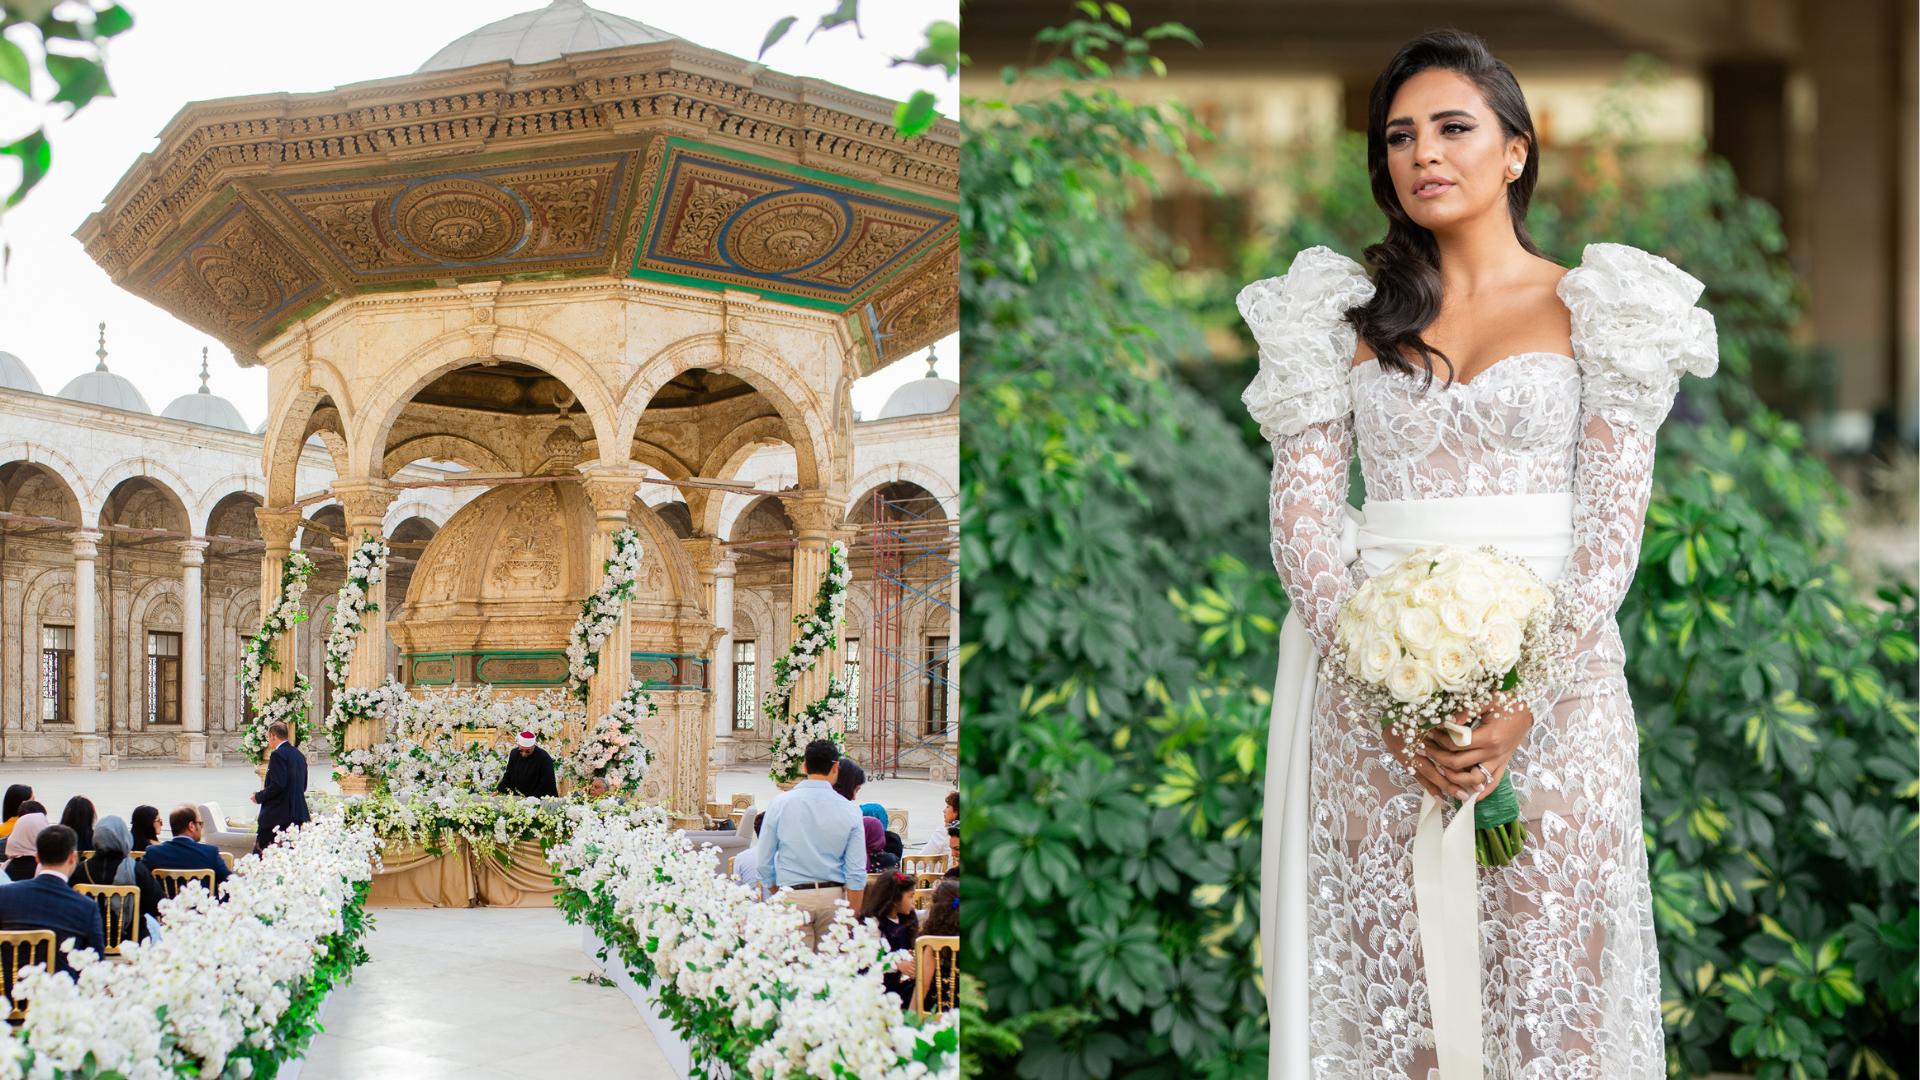 This Regional Designer Glammed Up Cairo's Latest High-Profile Wedding